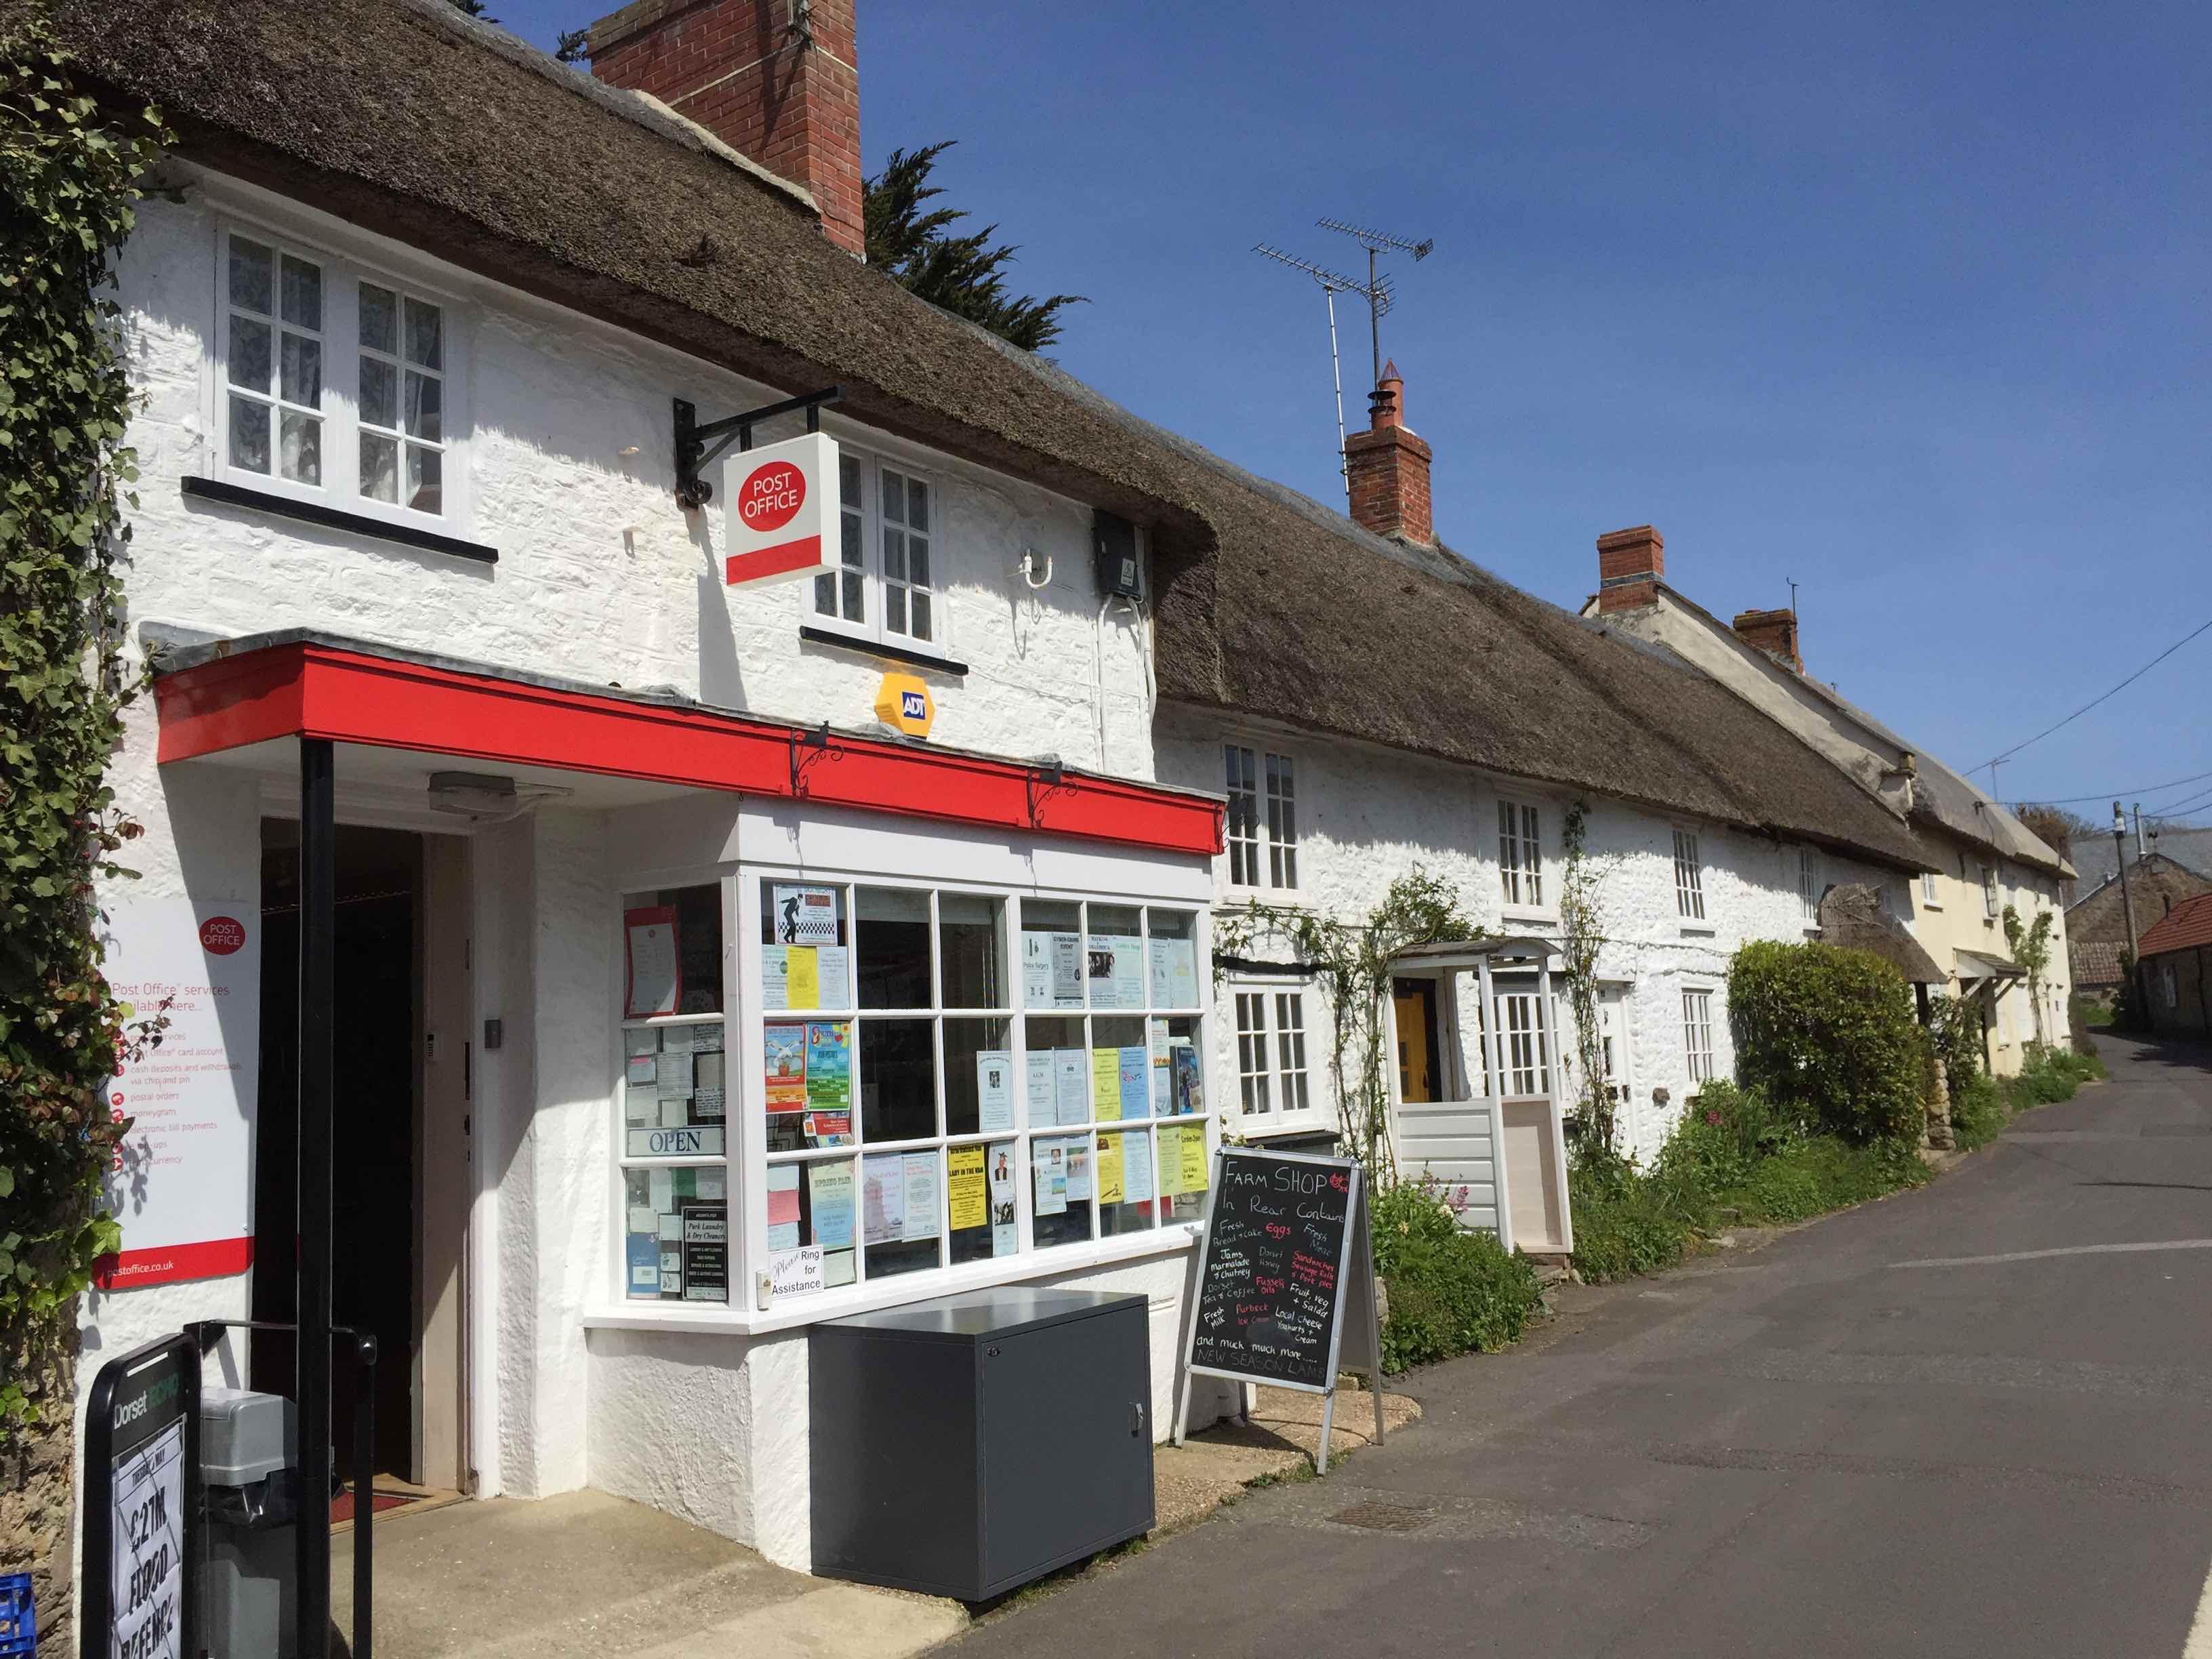 The Post Office Burton Bradstock